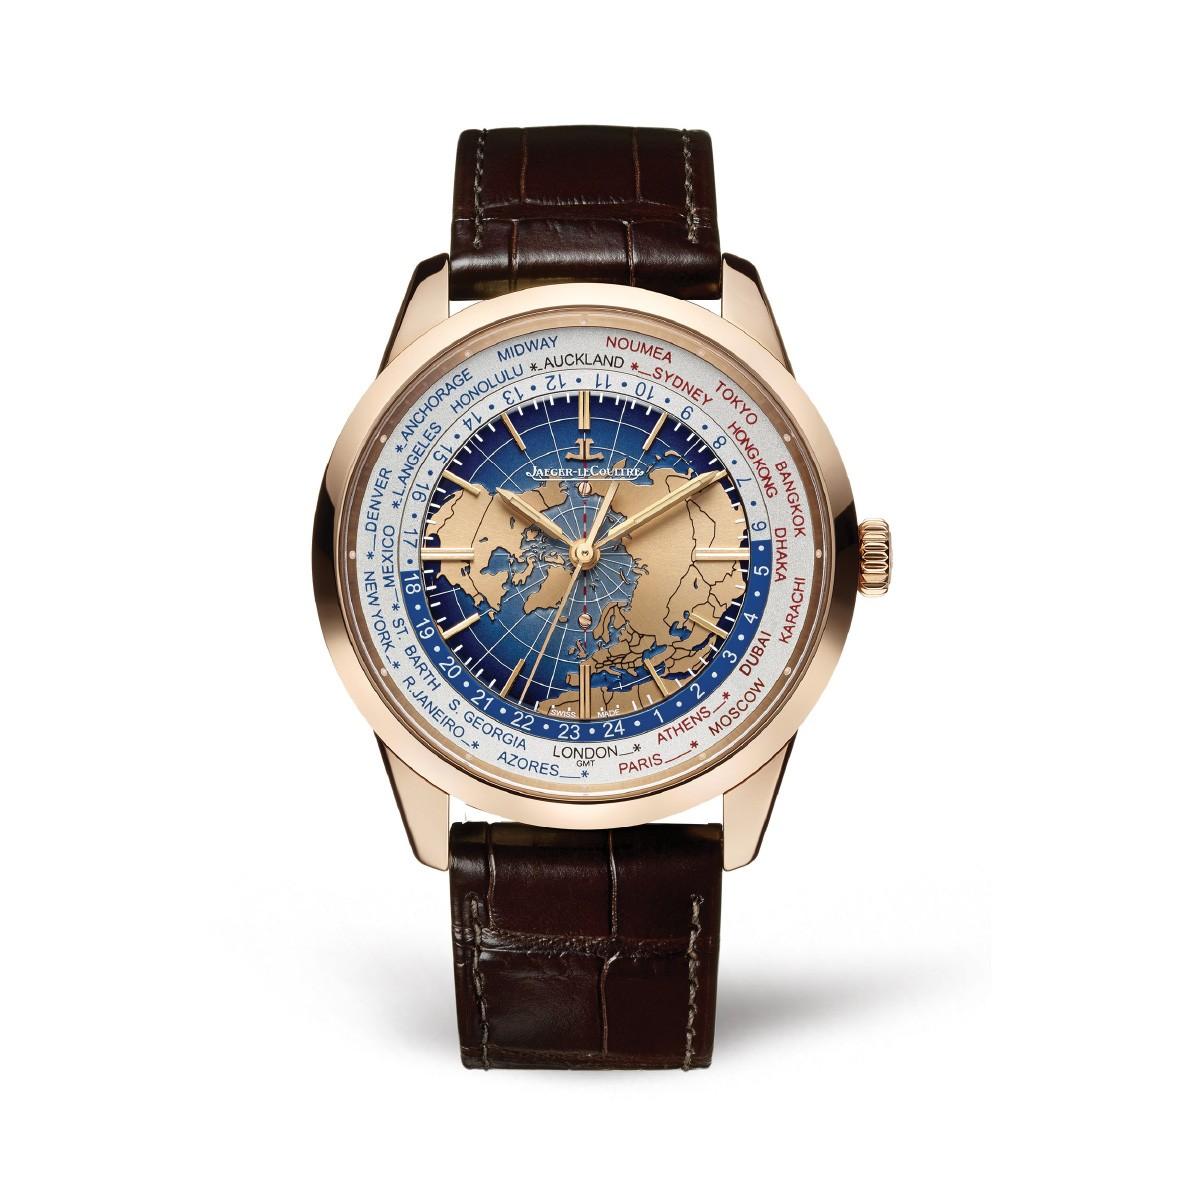 Produkt-11-JLC-Master-Geophysic-Universal-Time-ref-8102520-Preis-24